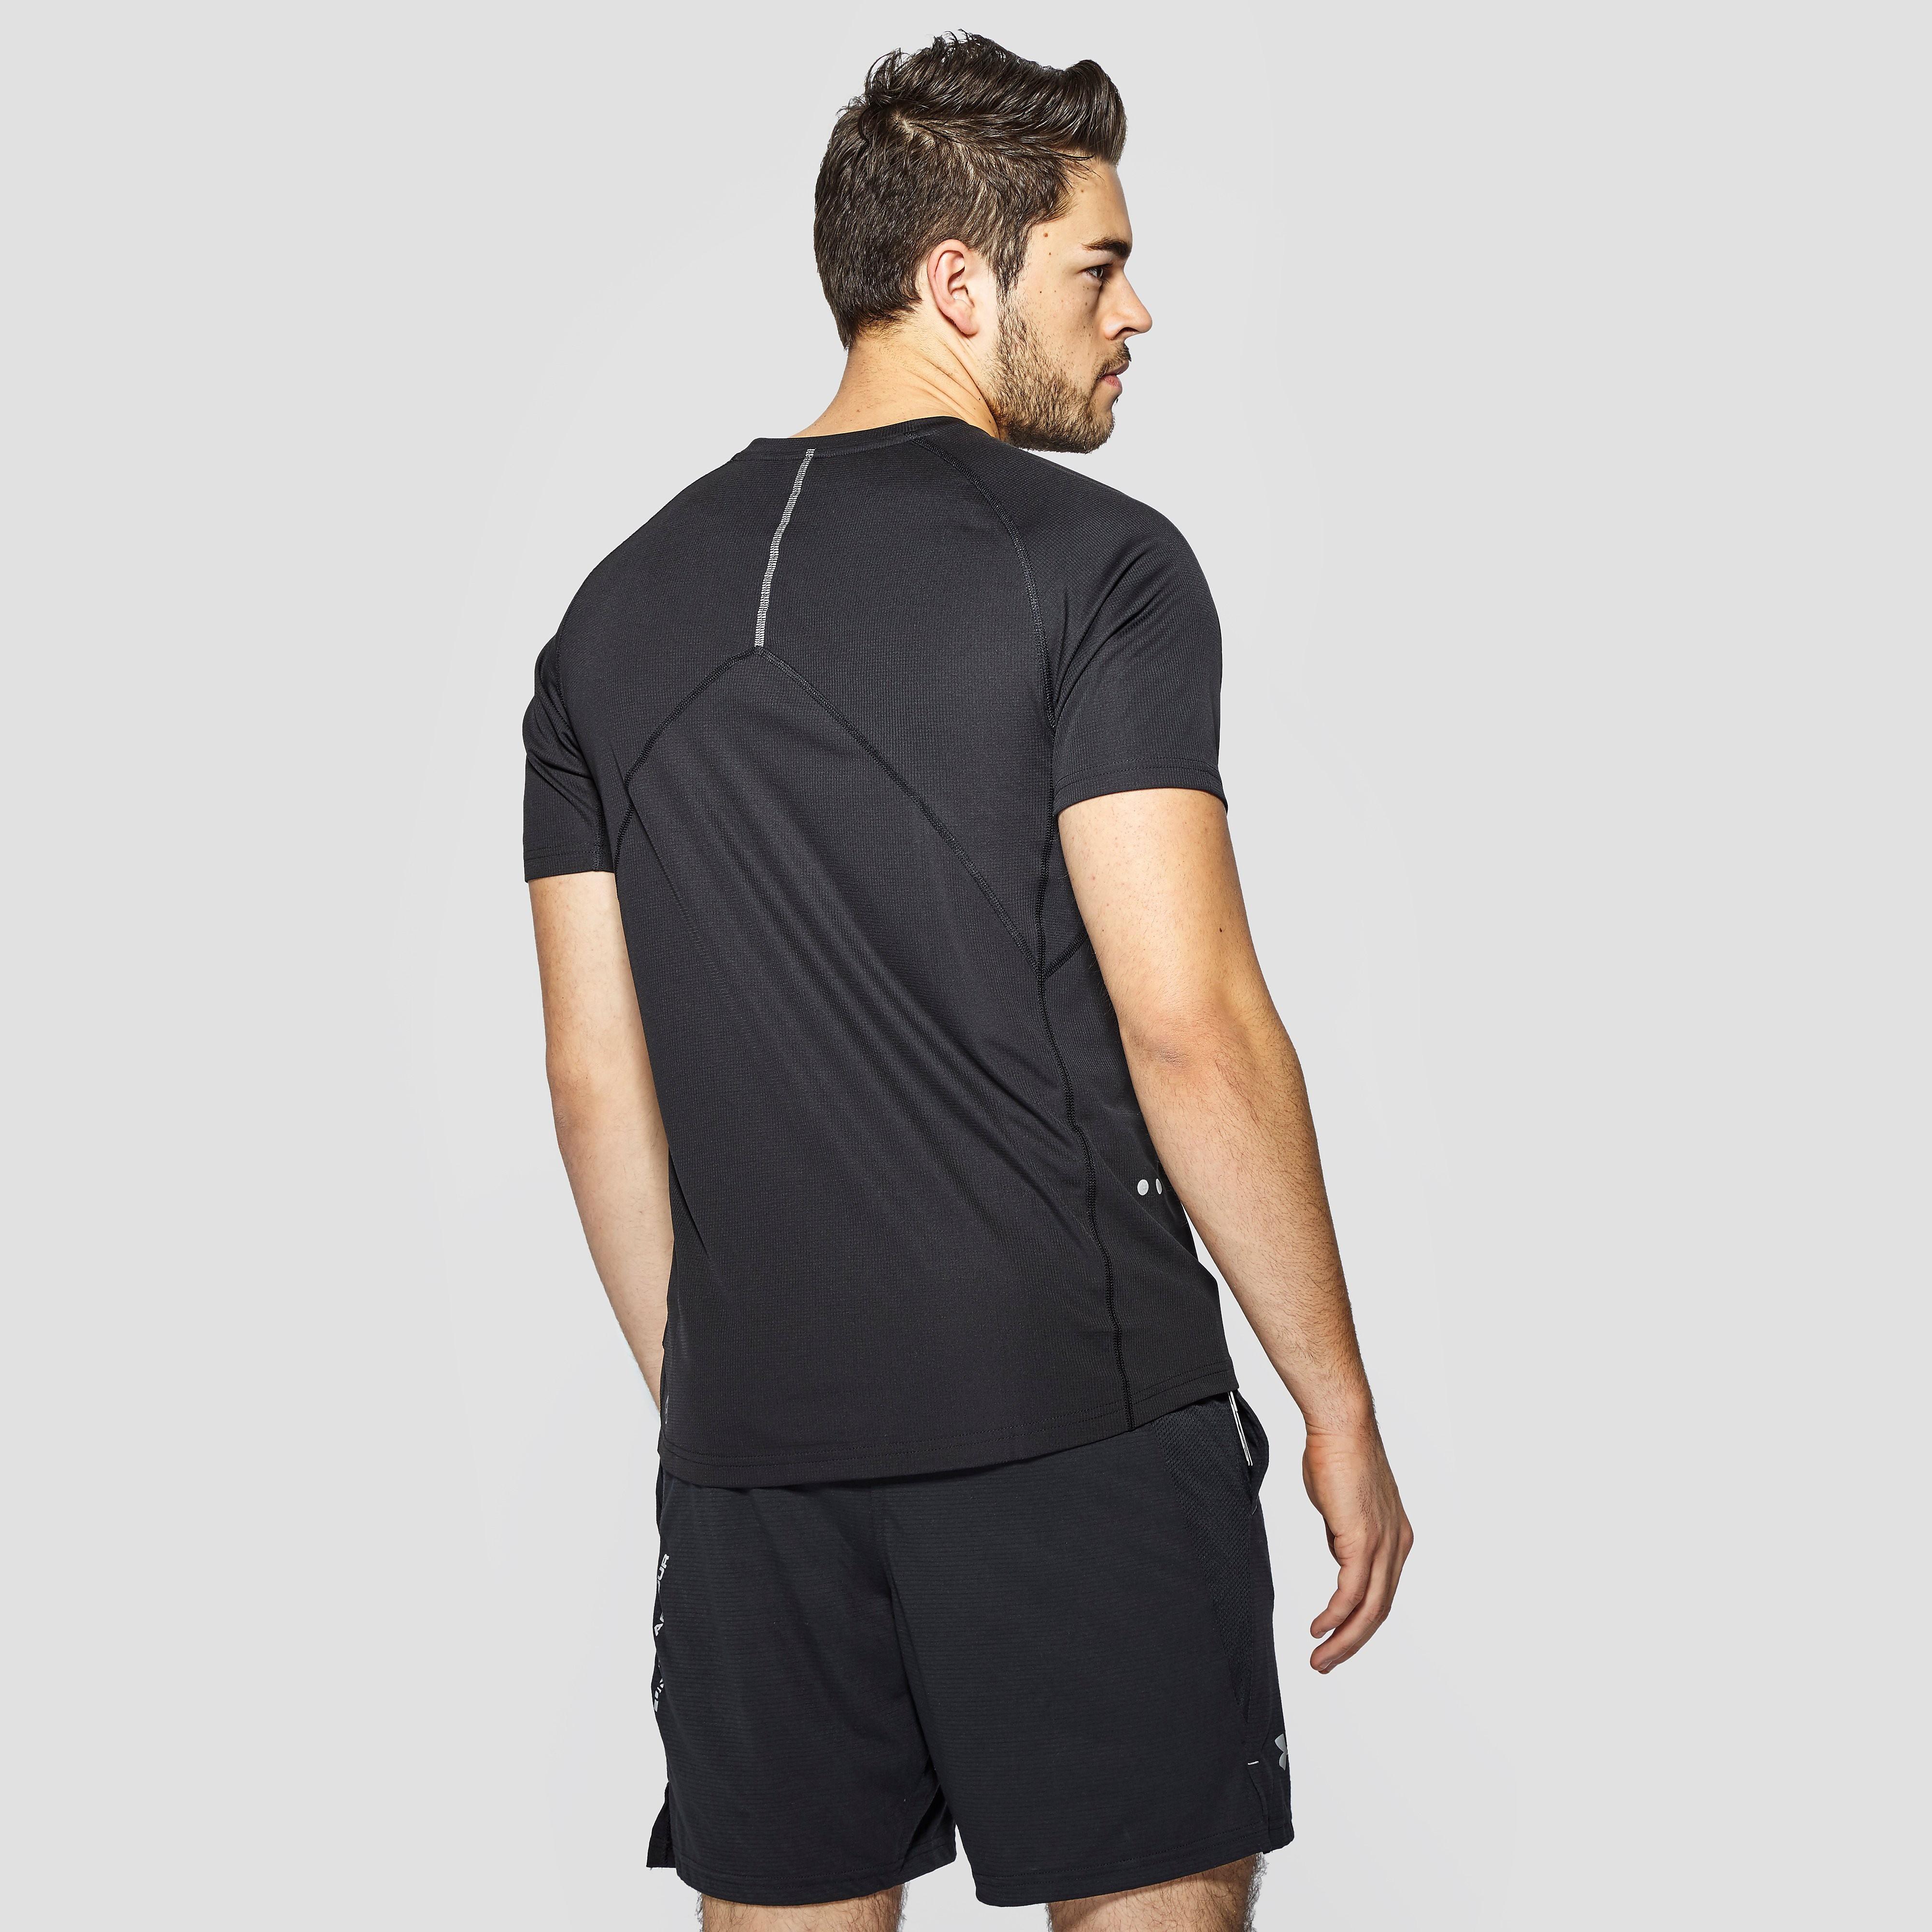 Puma Run Short Sleeved Men's T-shirt